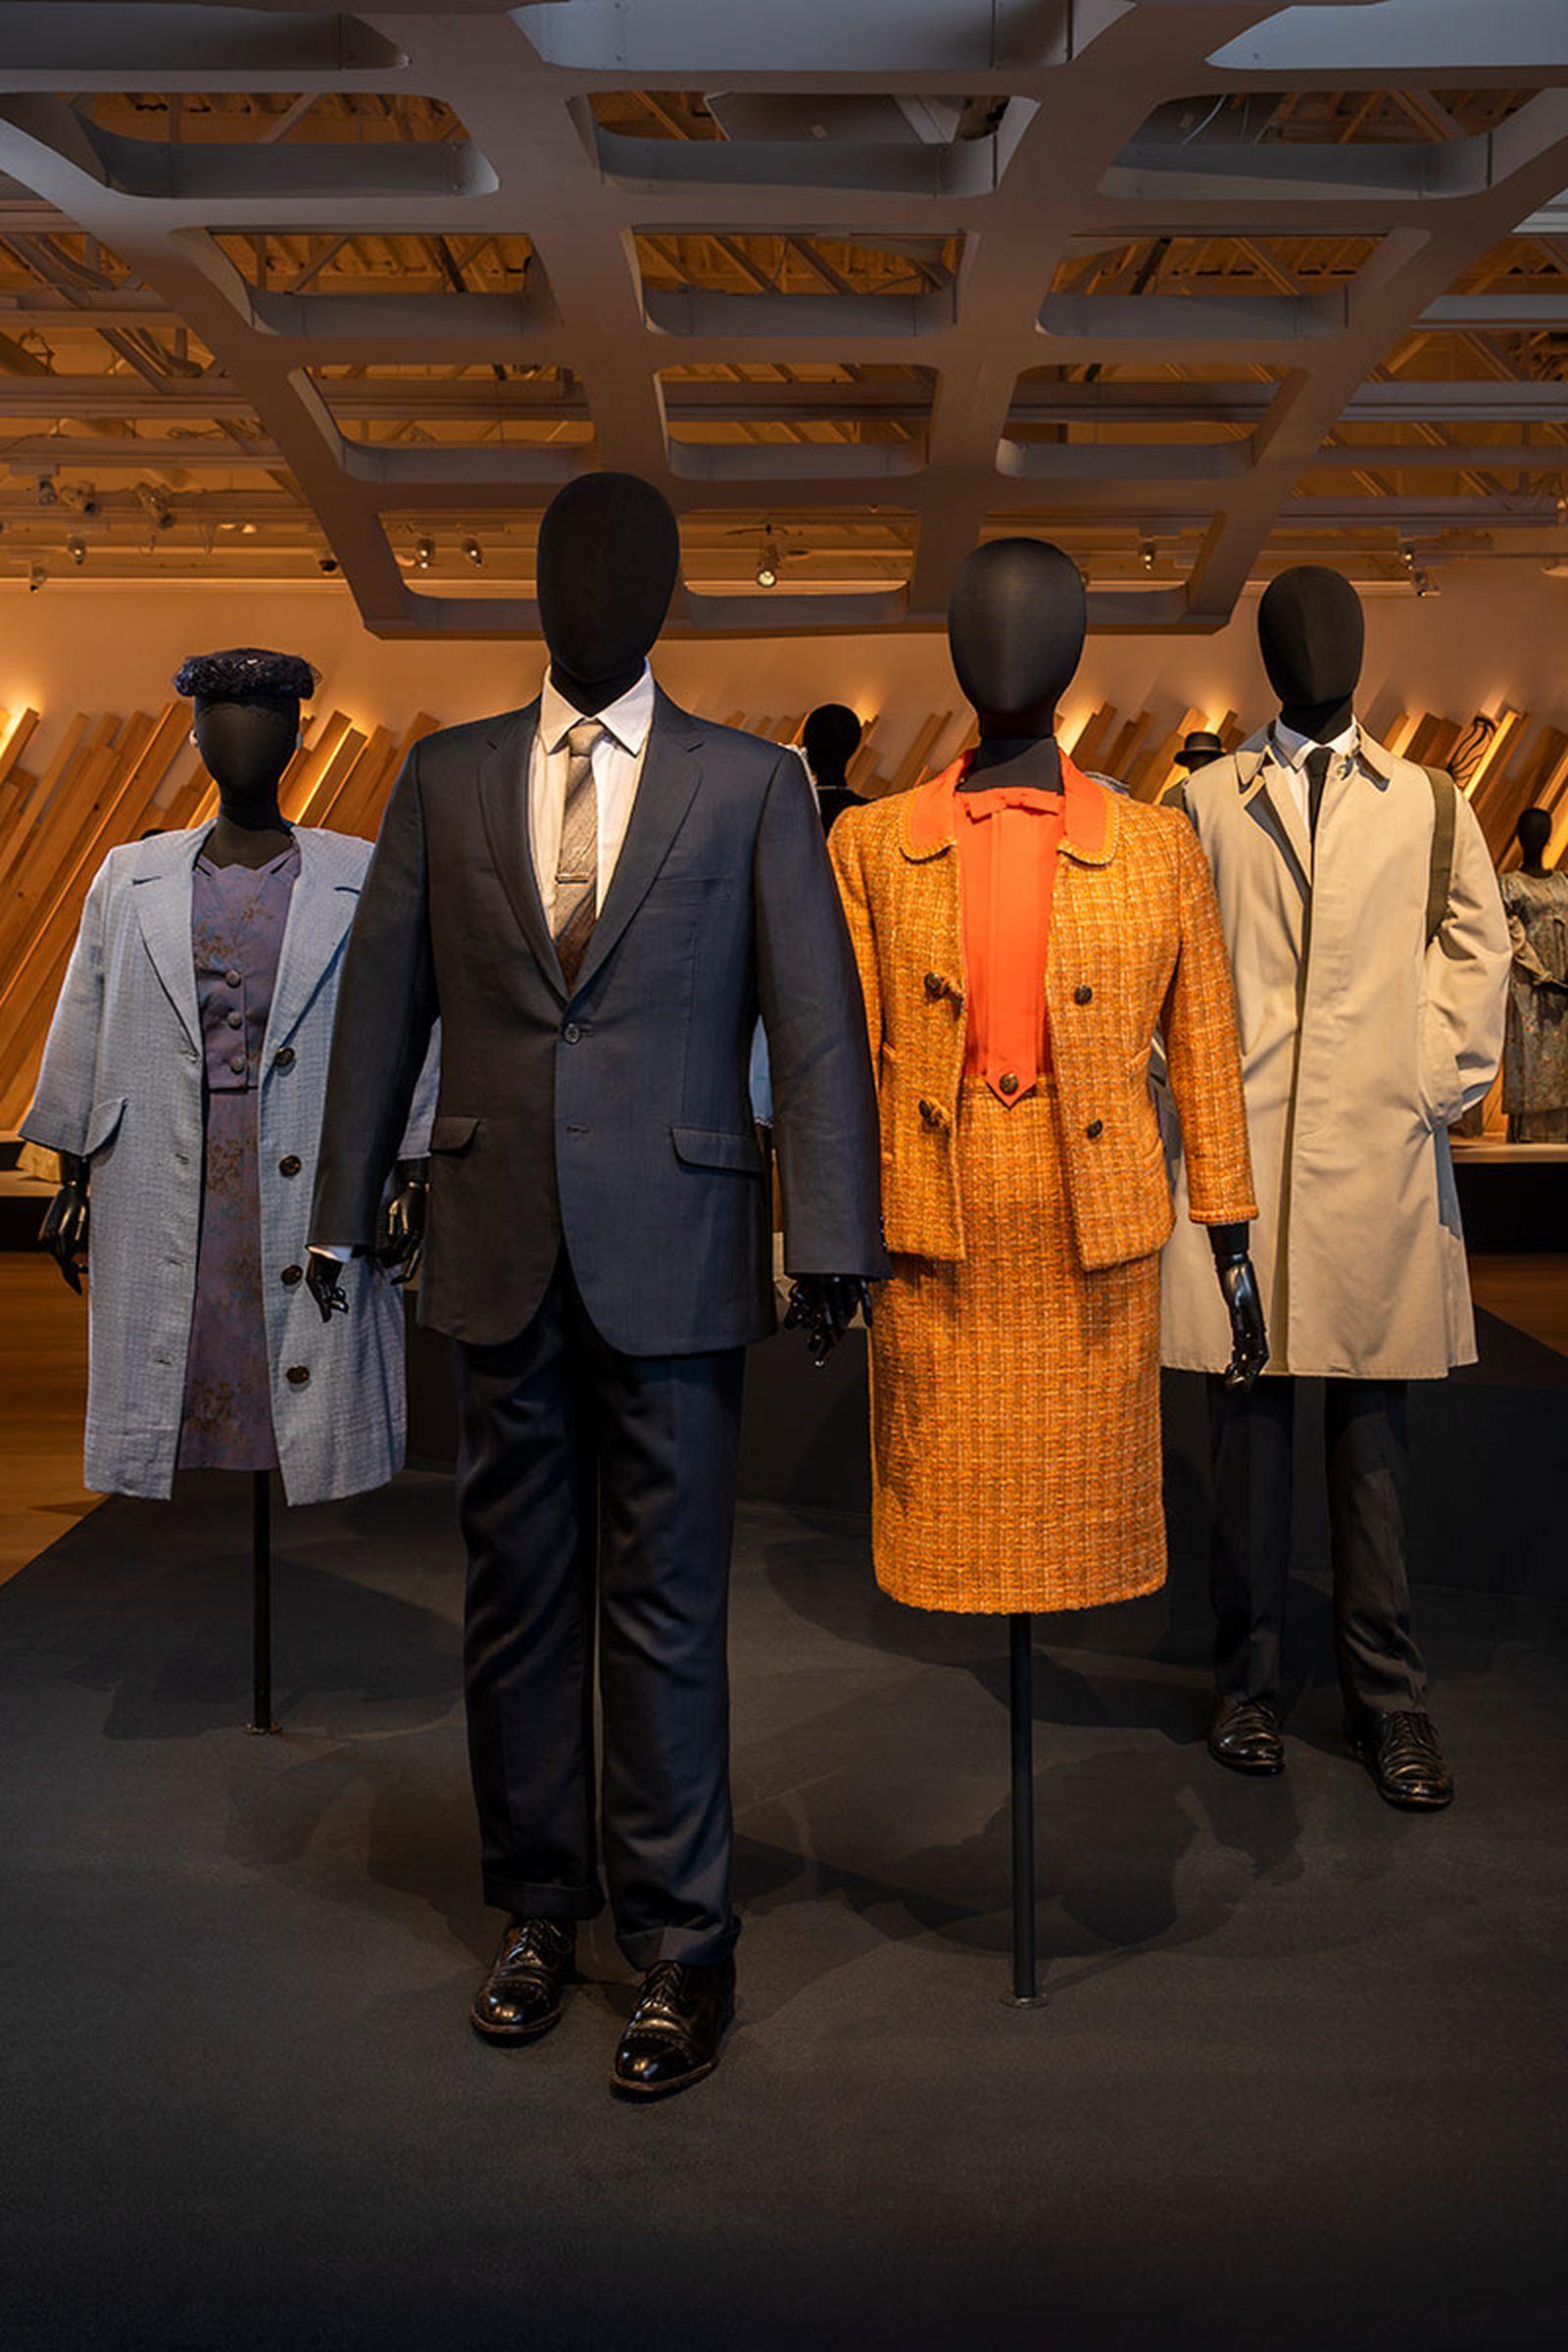 ruth-e-carters-afrofuturism-costume-design-08